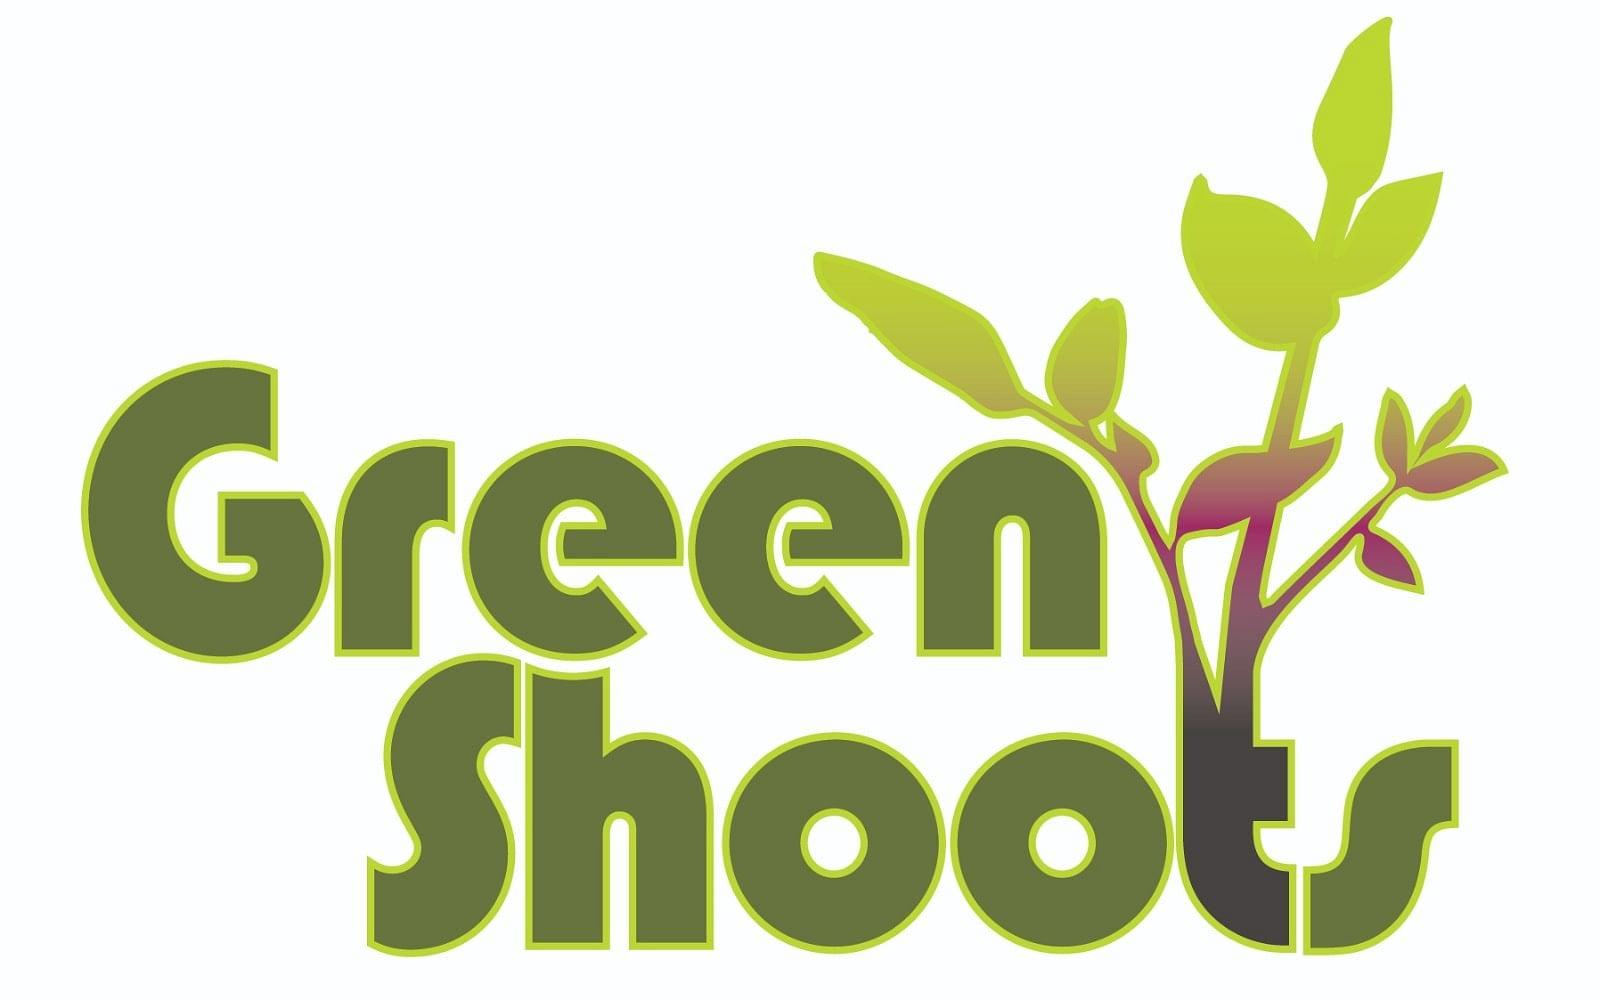 Green Shoots logo.